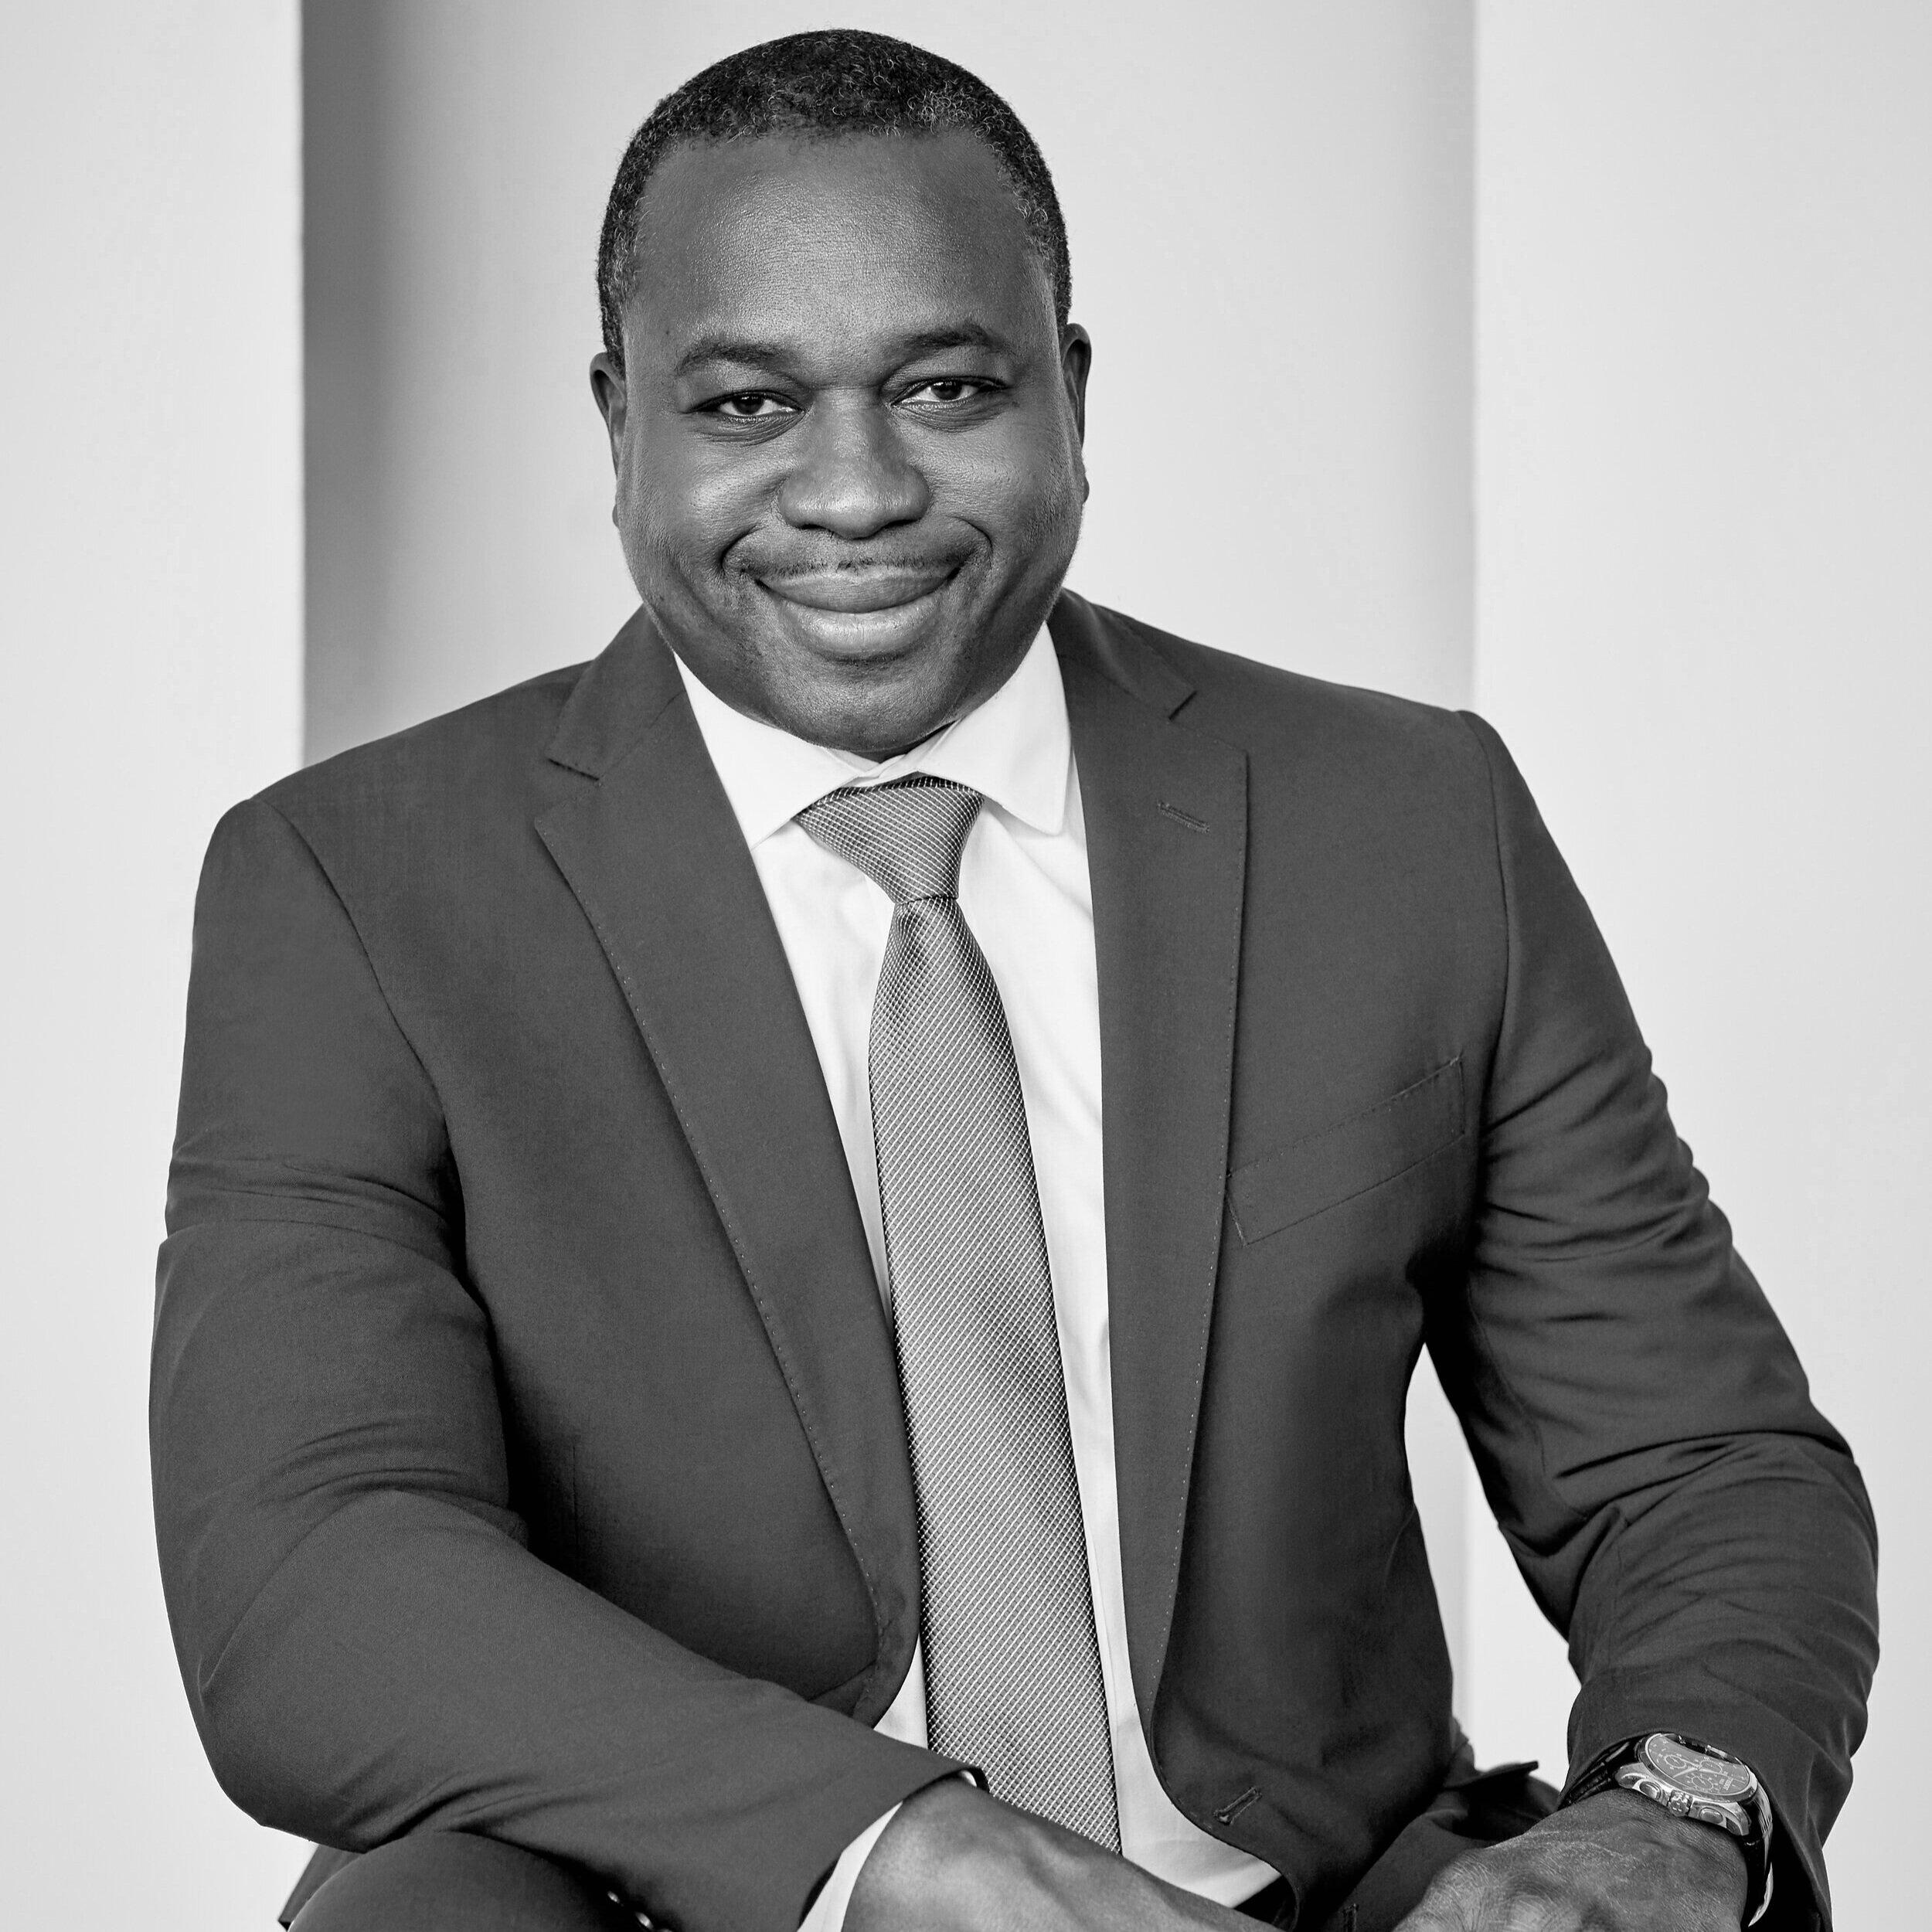 Macky Tall - Chef des marchés liquides, CDPQPrésident et chef de la direction, CDPQ Infra